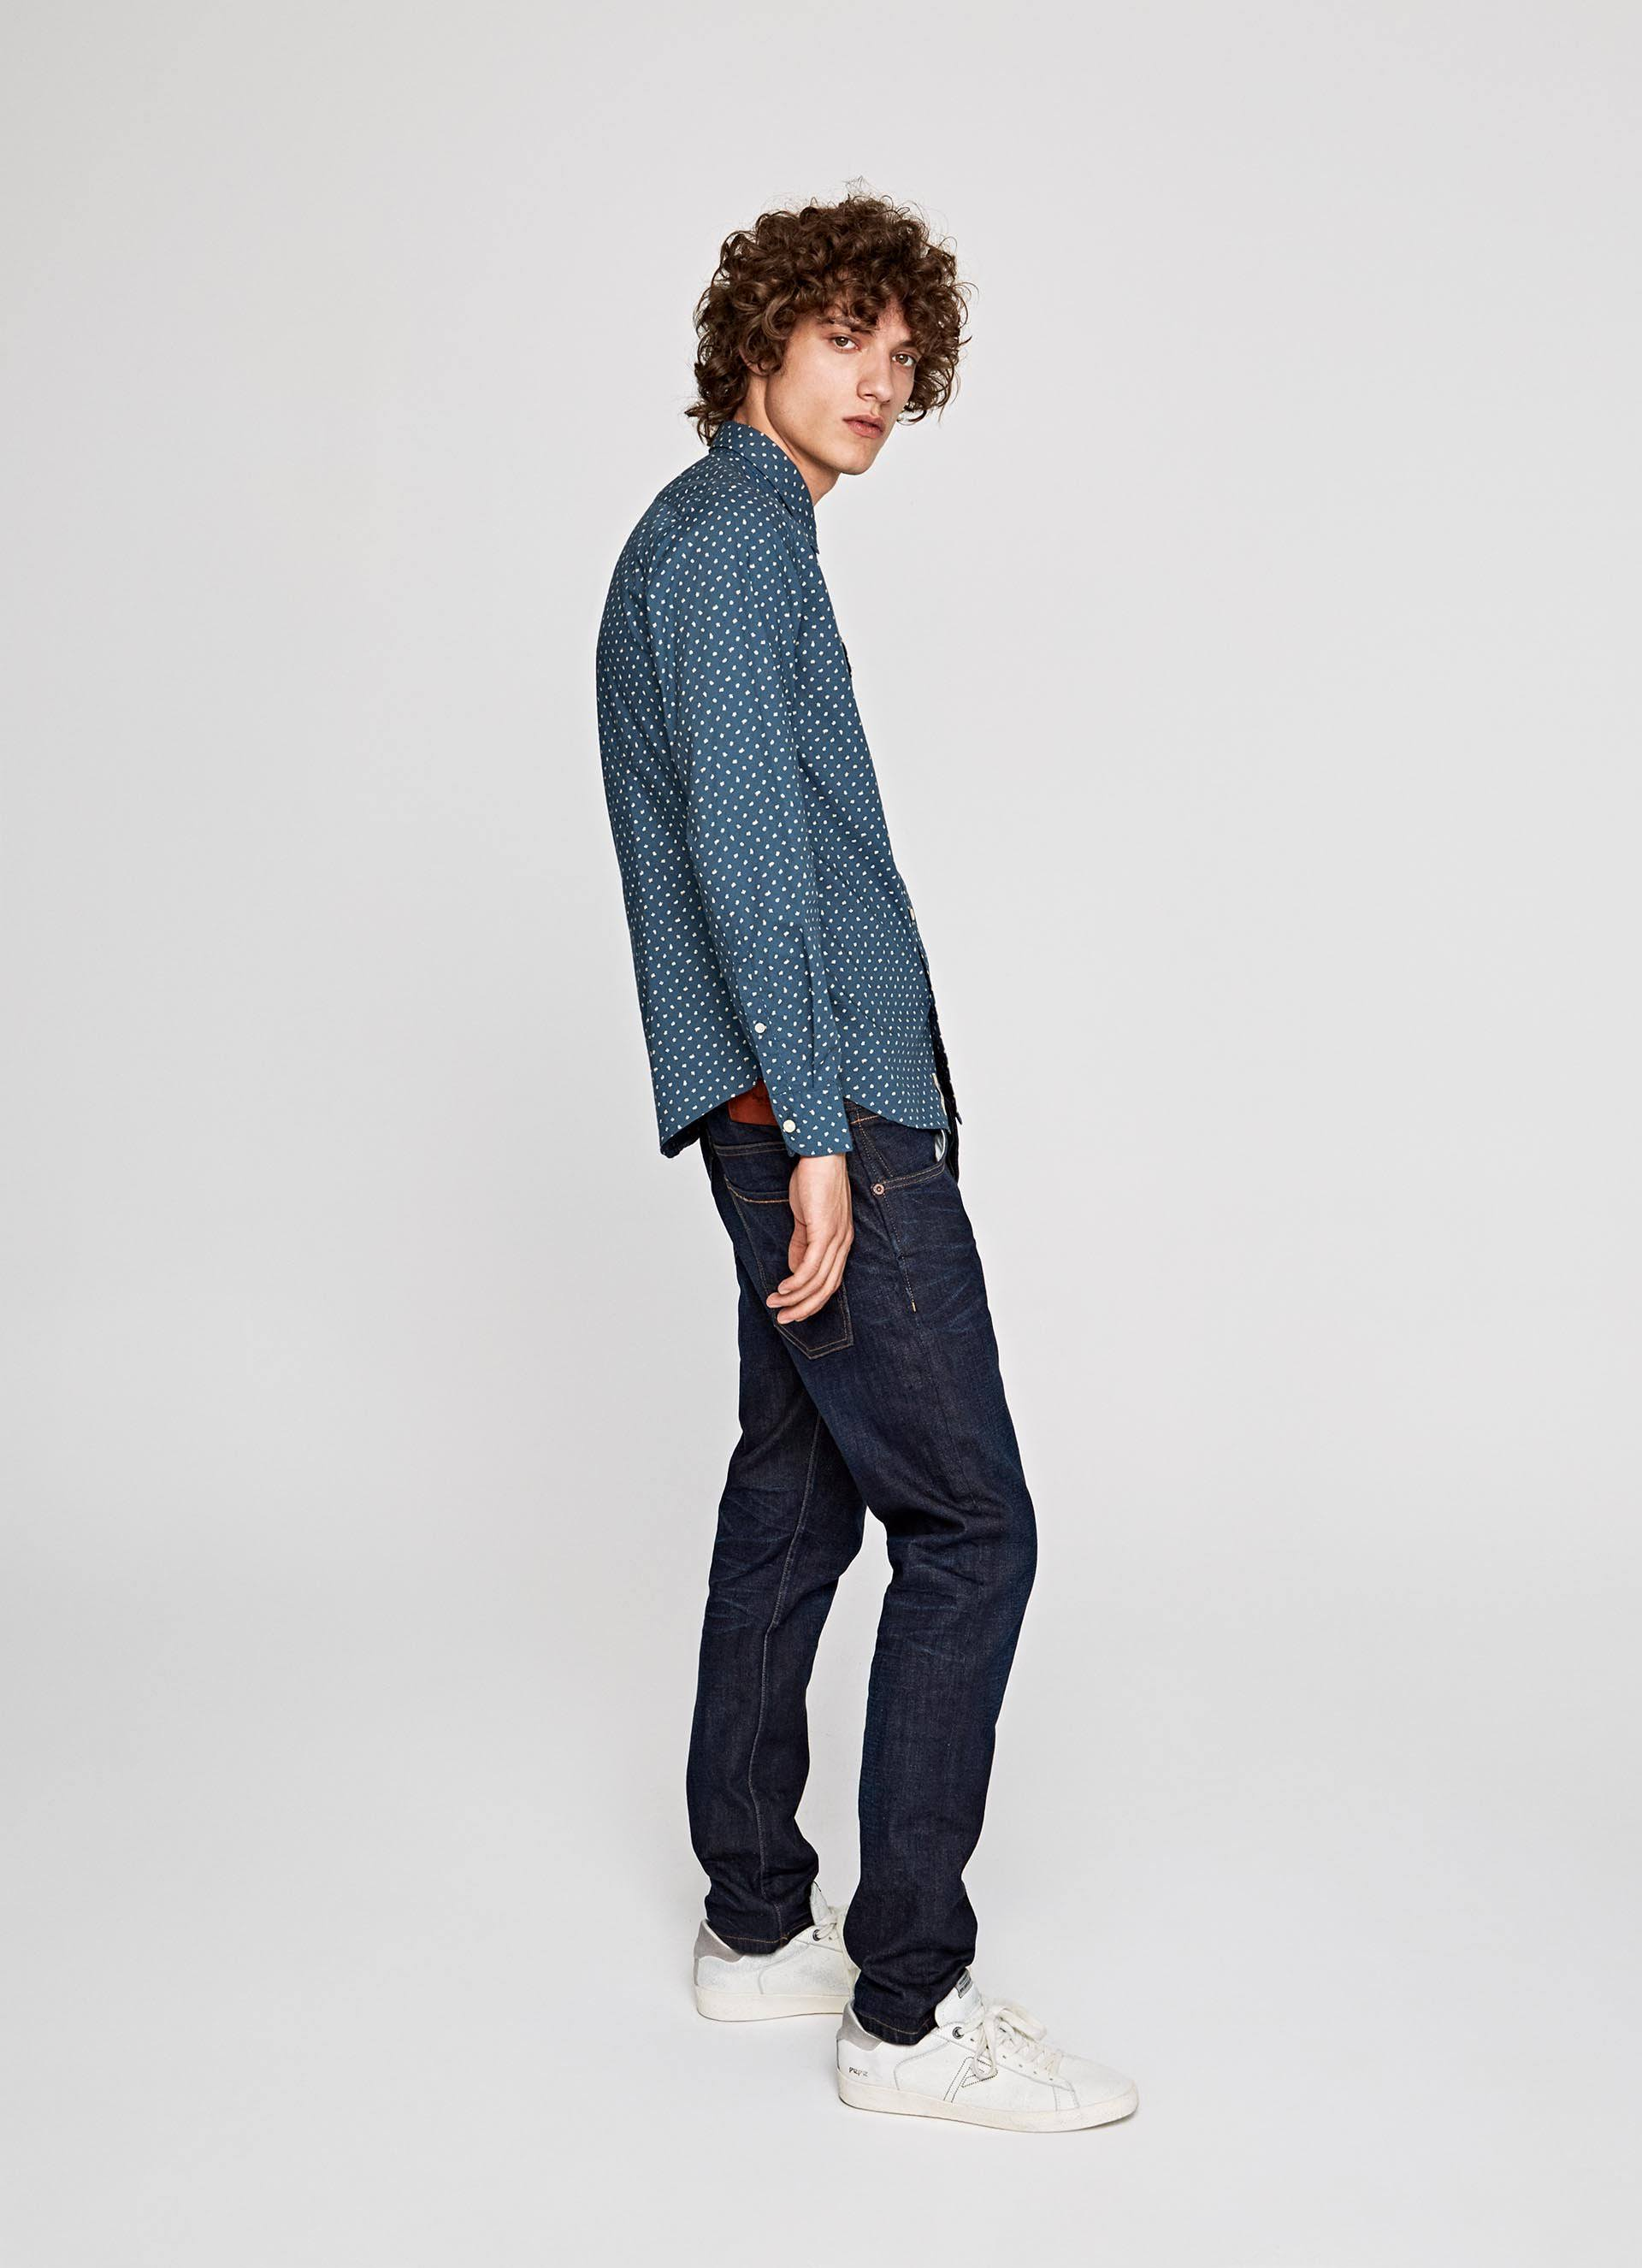 Sterlingblue Jeans Jeans Pepe Halberton Sterlingblue Halberton M M Pepe qOwHxv7